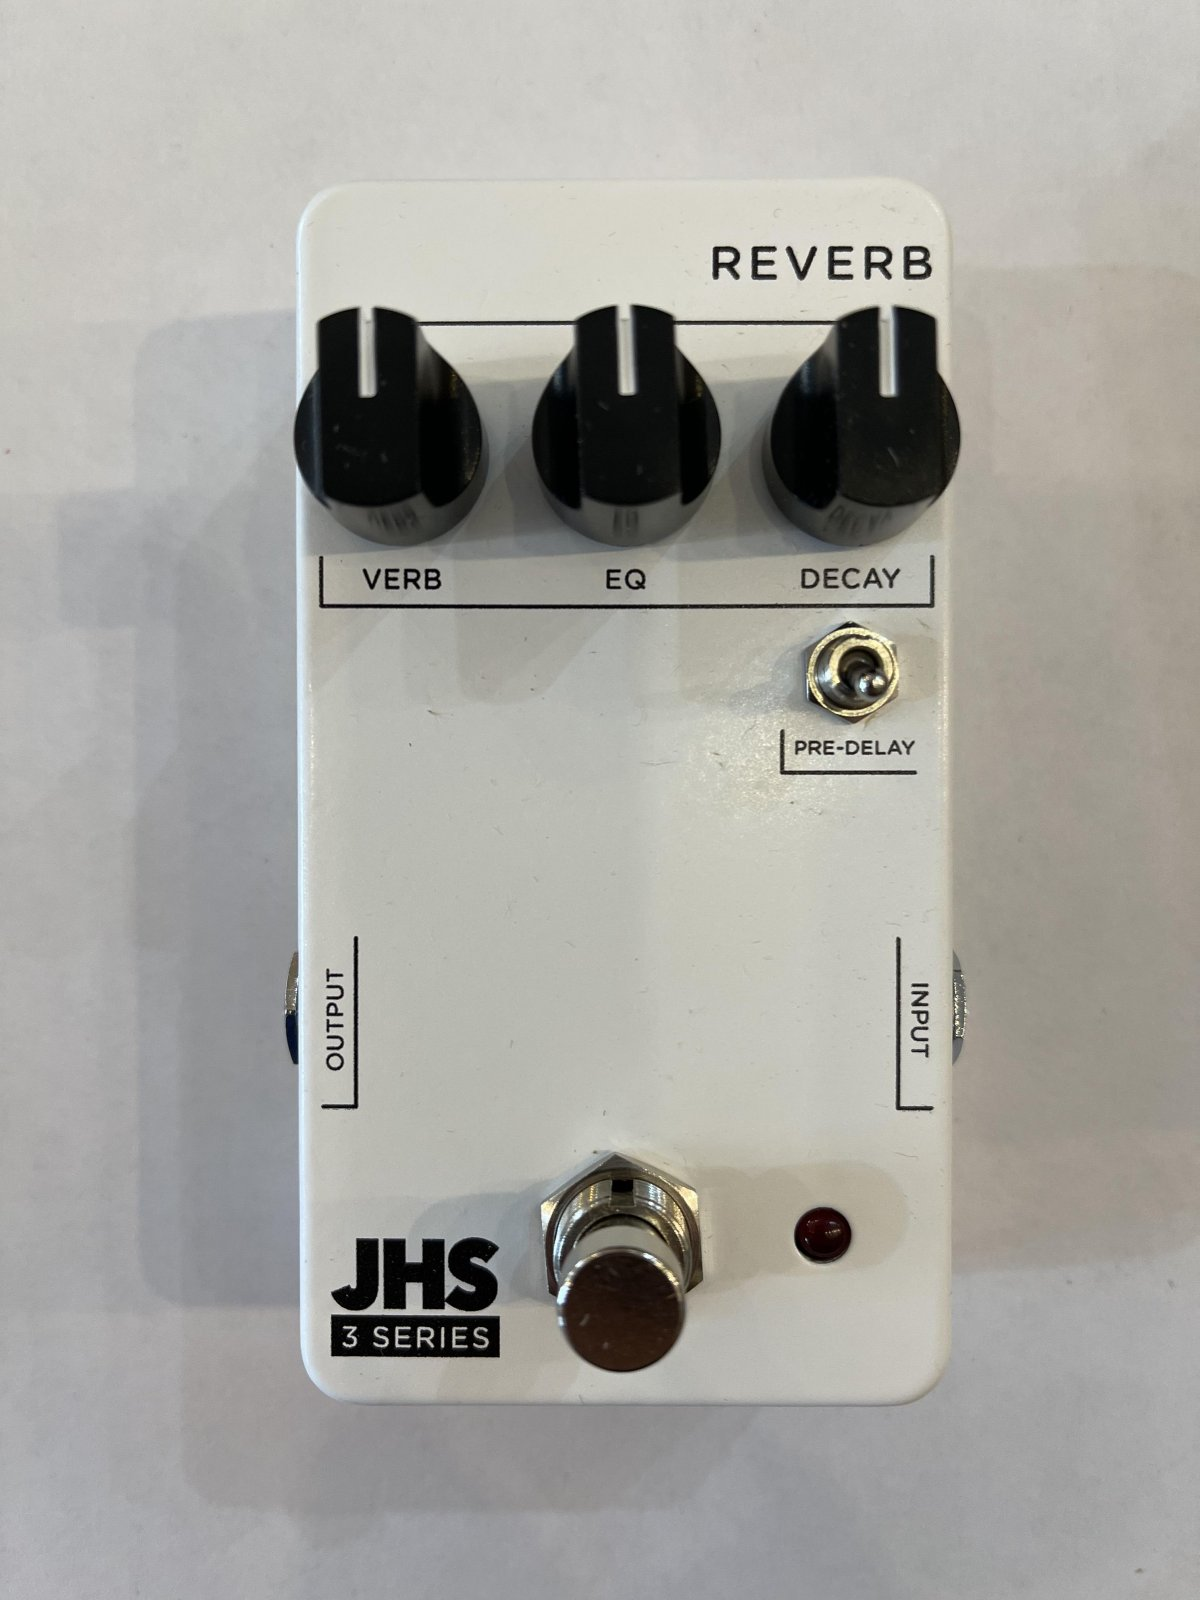 JHS 3 Series Reverb Pedal